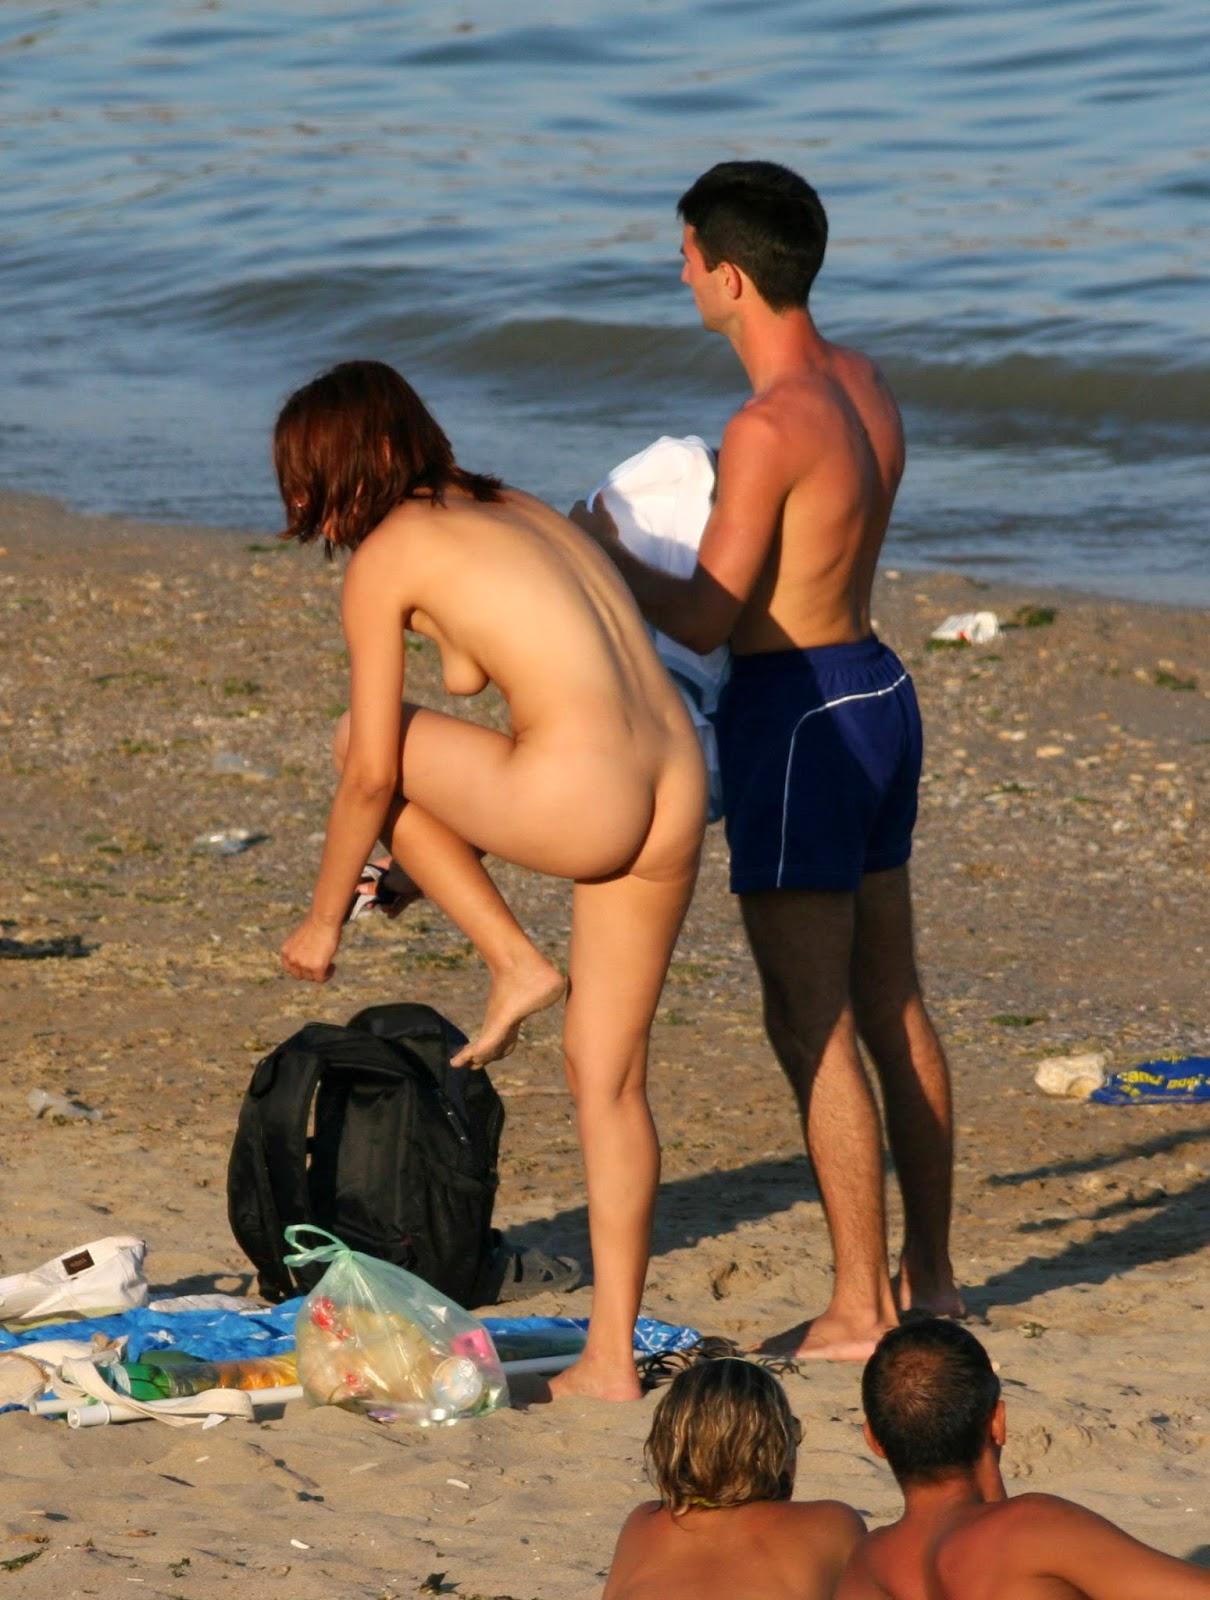 asian nude screensaver